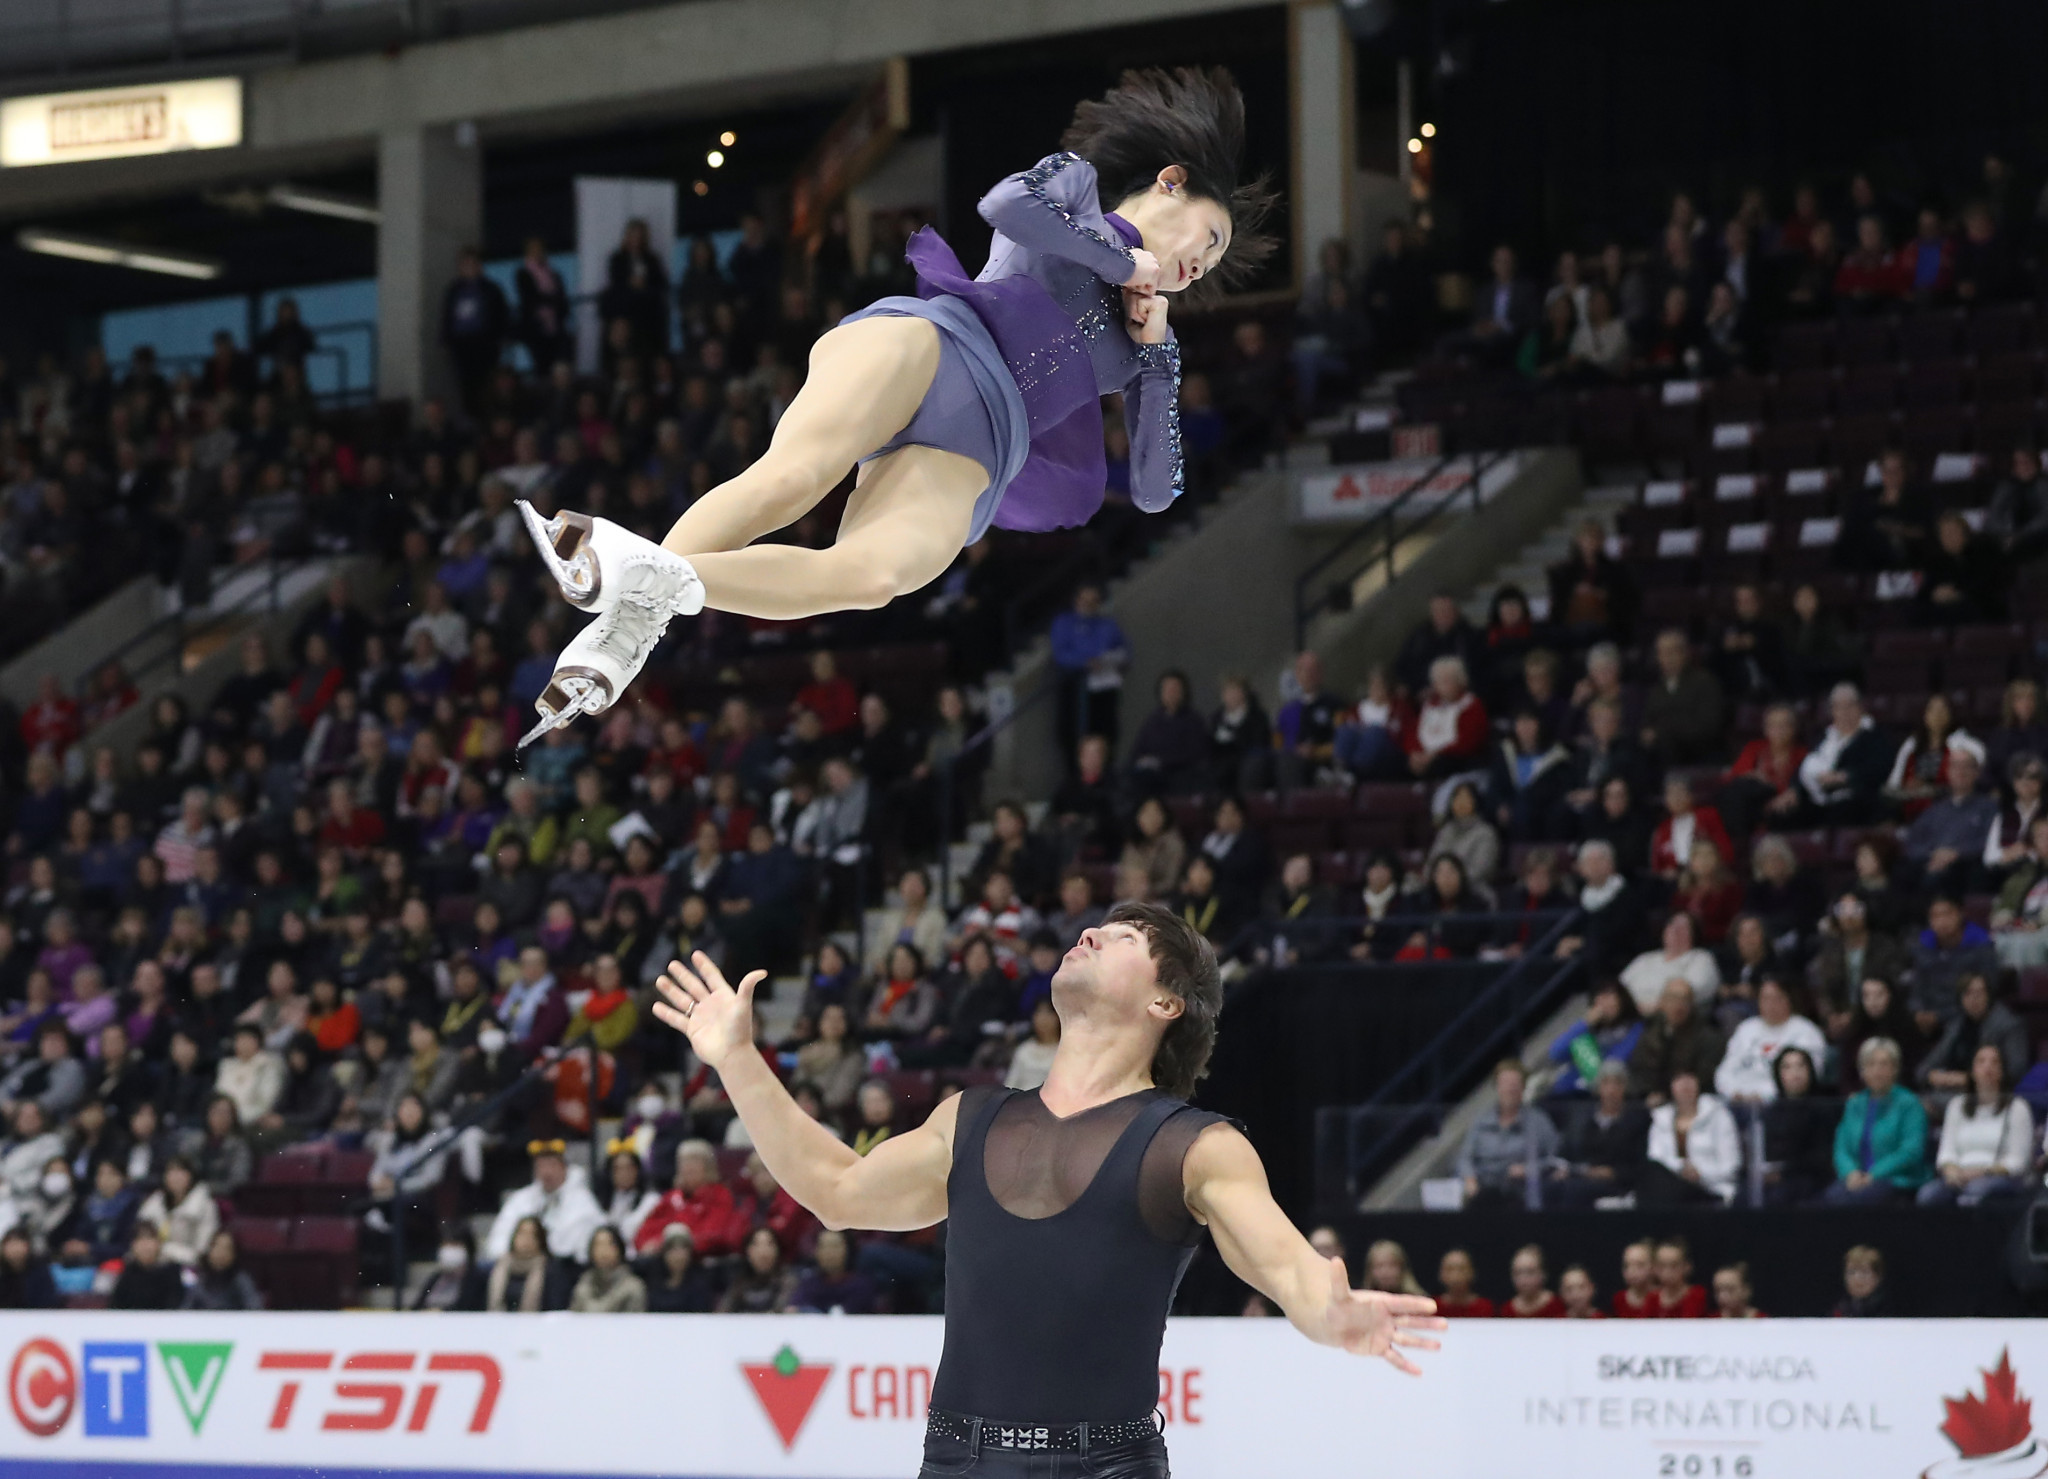 Kavaguti and Smirnov retire from figure skating